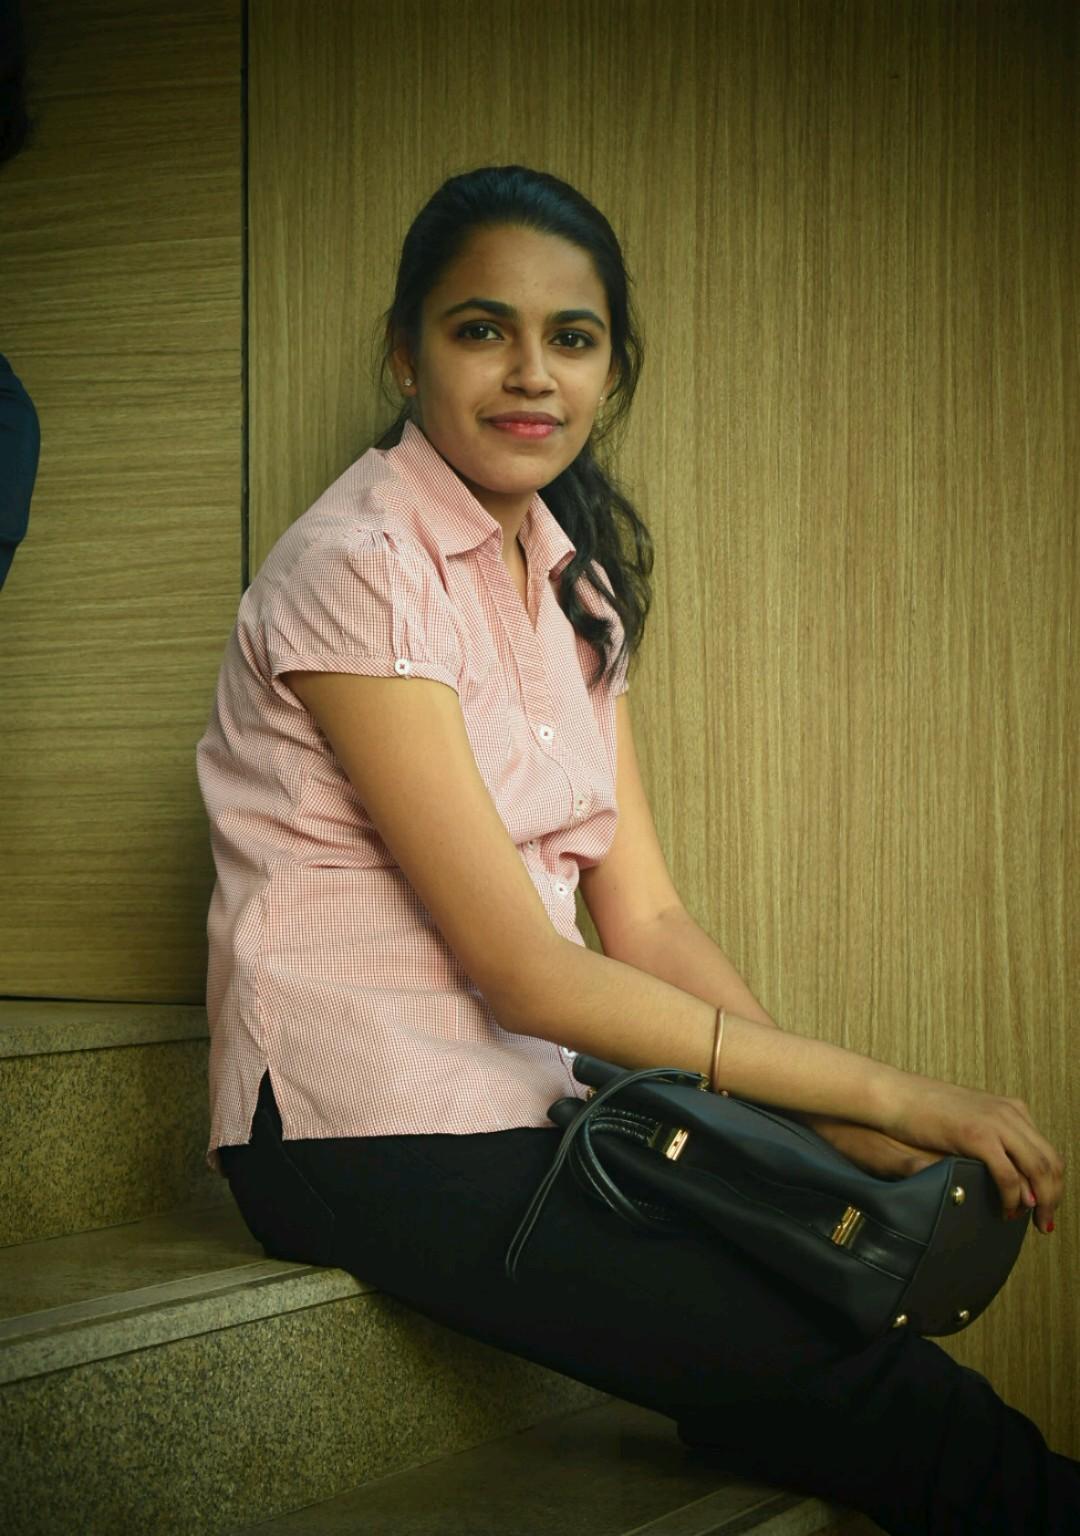 Pratyusha ACDS Course creator at PaperVideo